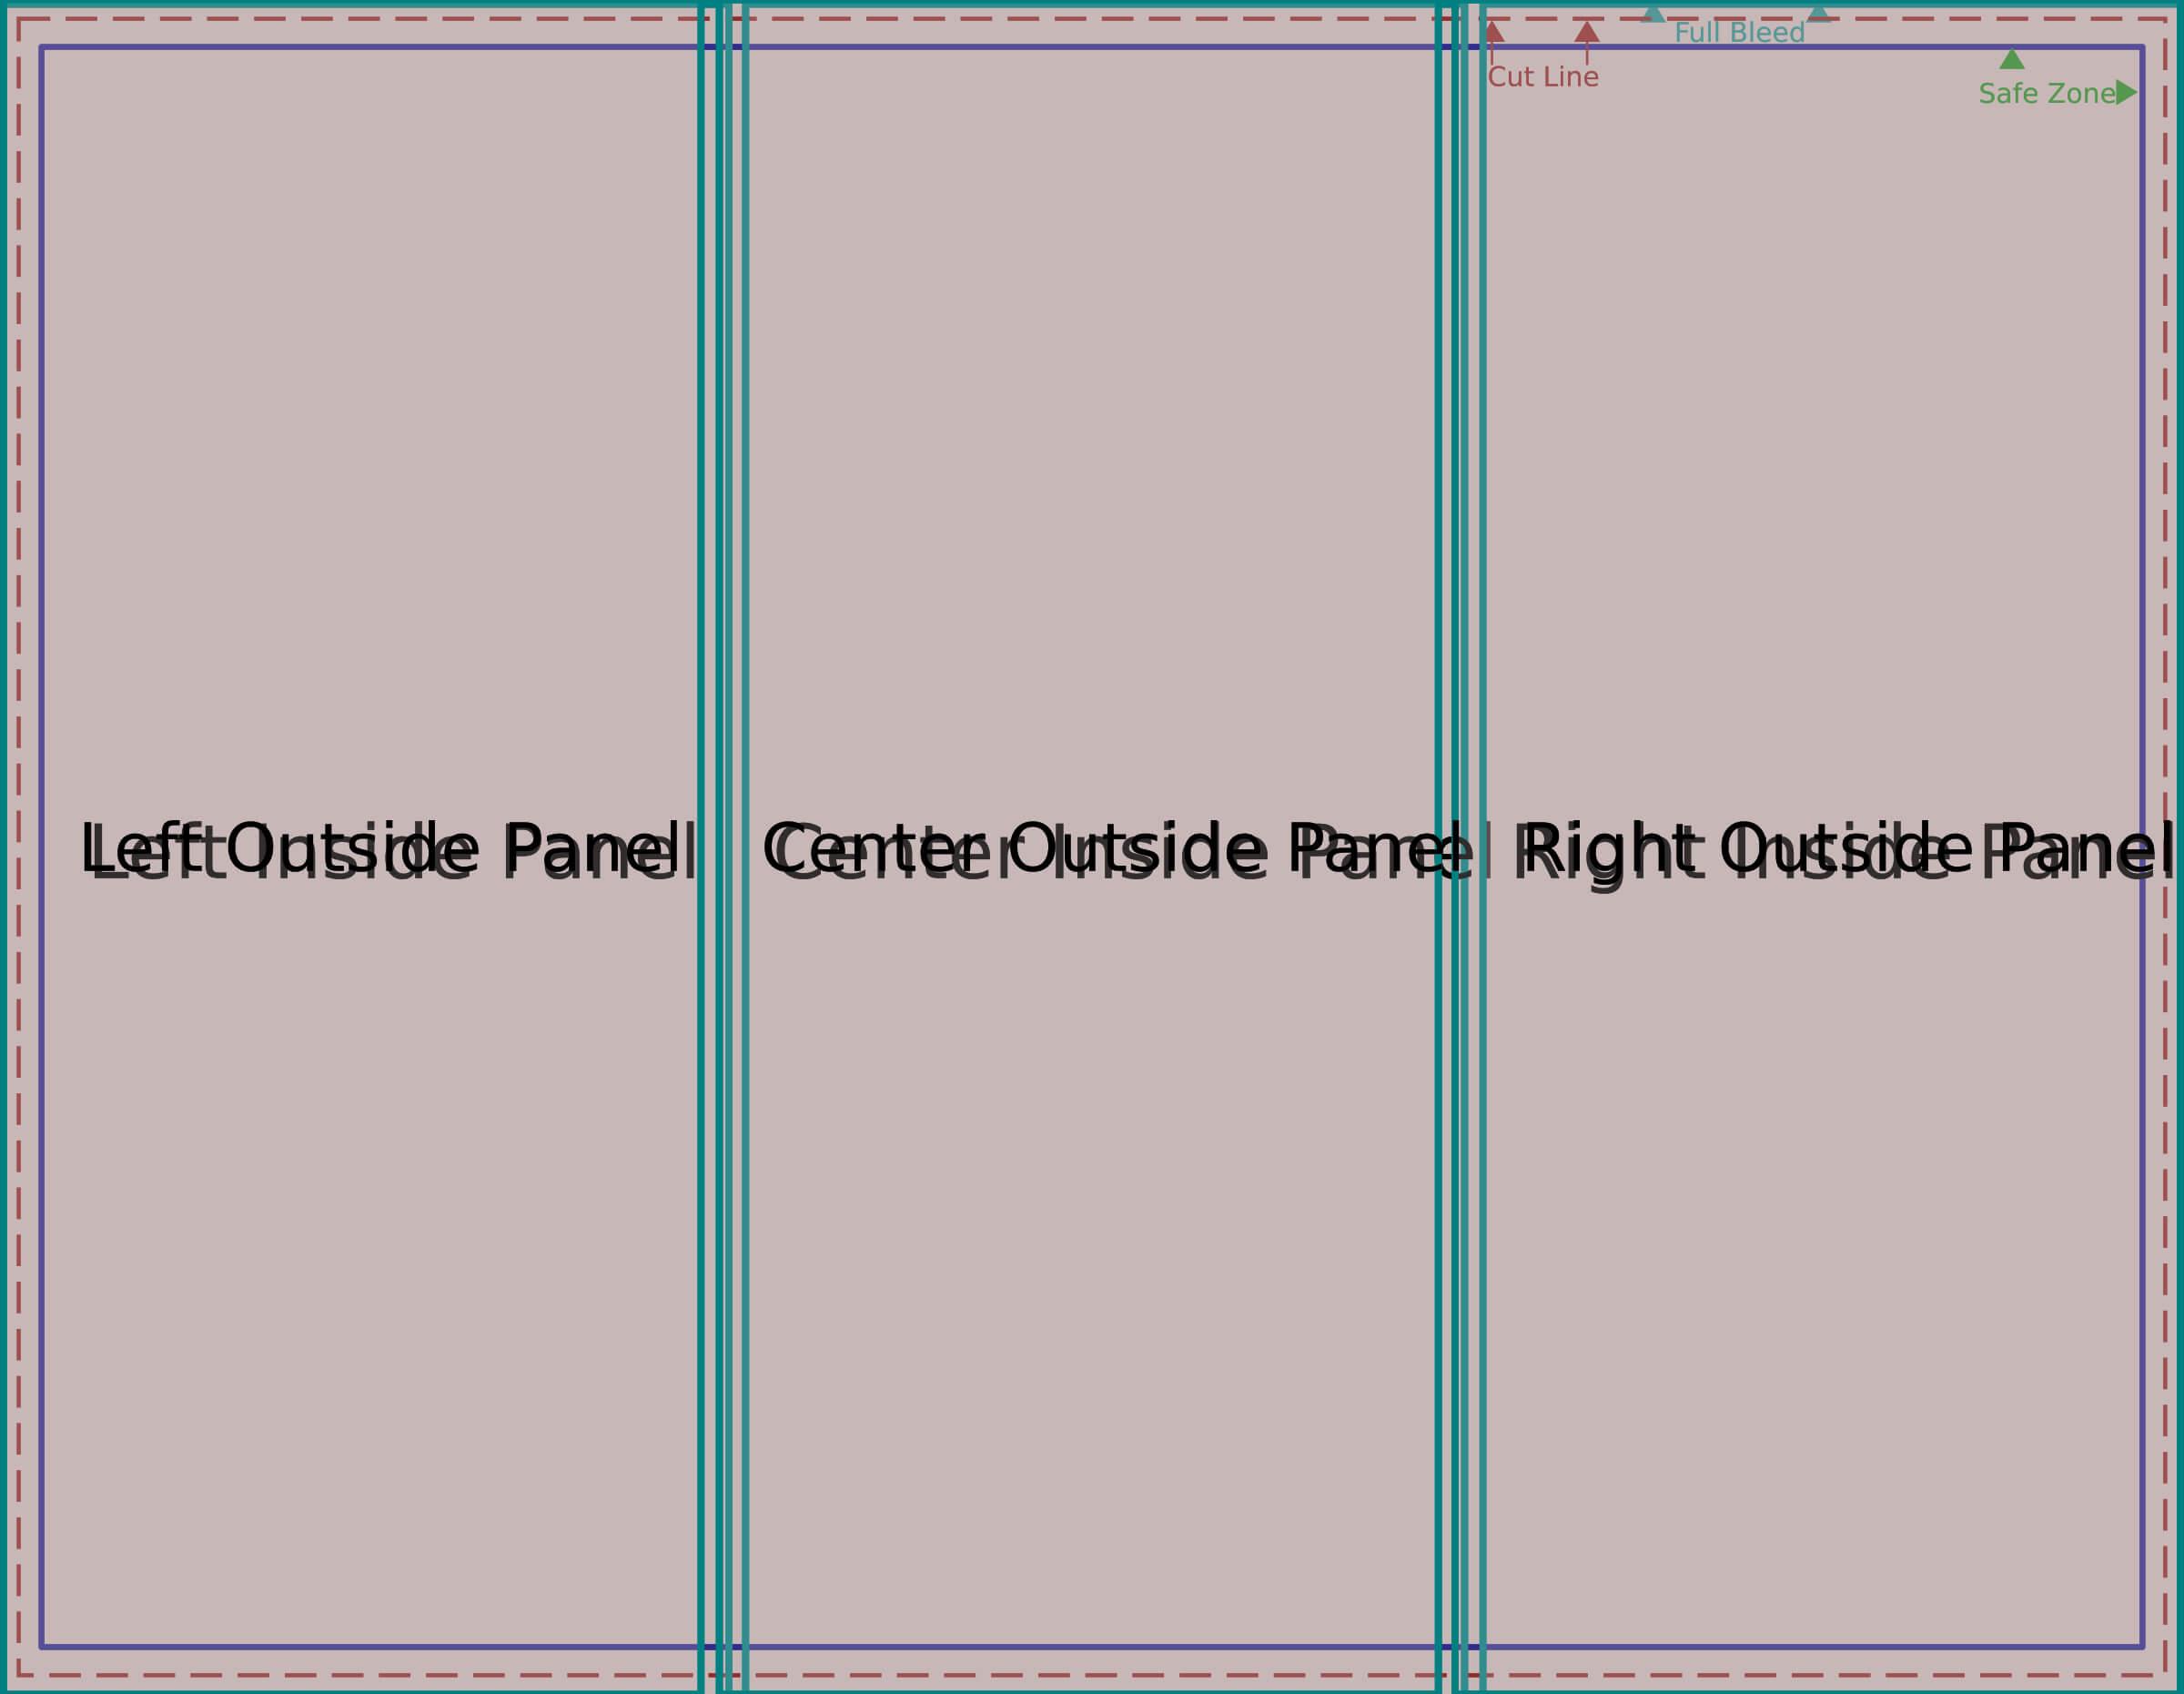 Folding Brochure Templates Clipart Images Gallery For Free regarding Brochure Folding Templates